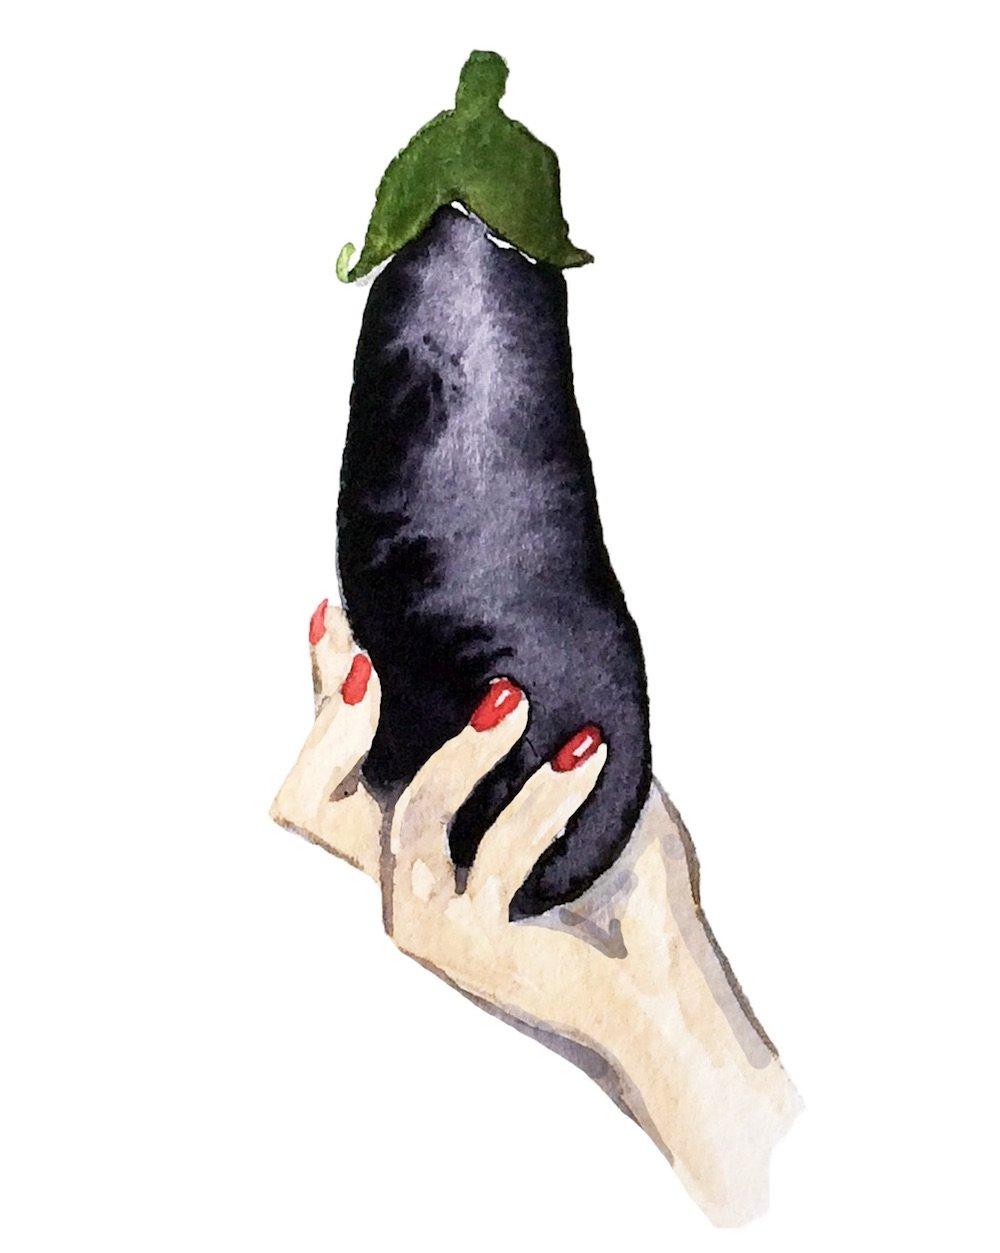 eggplant-penis-blow-job